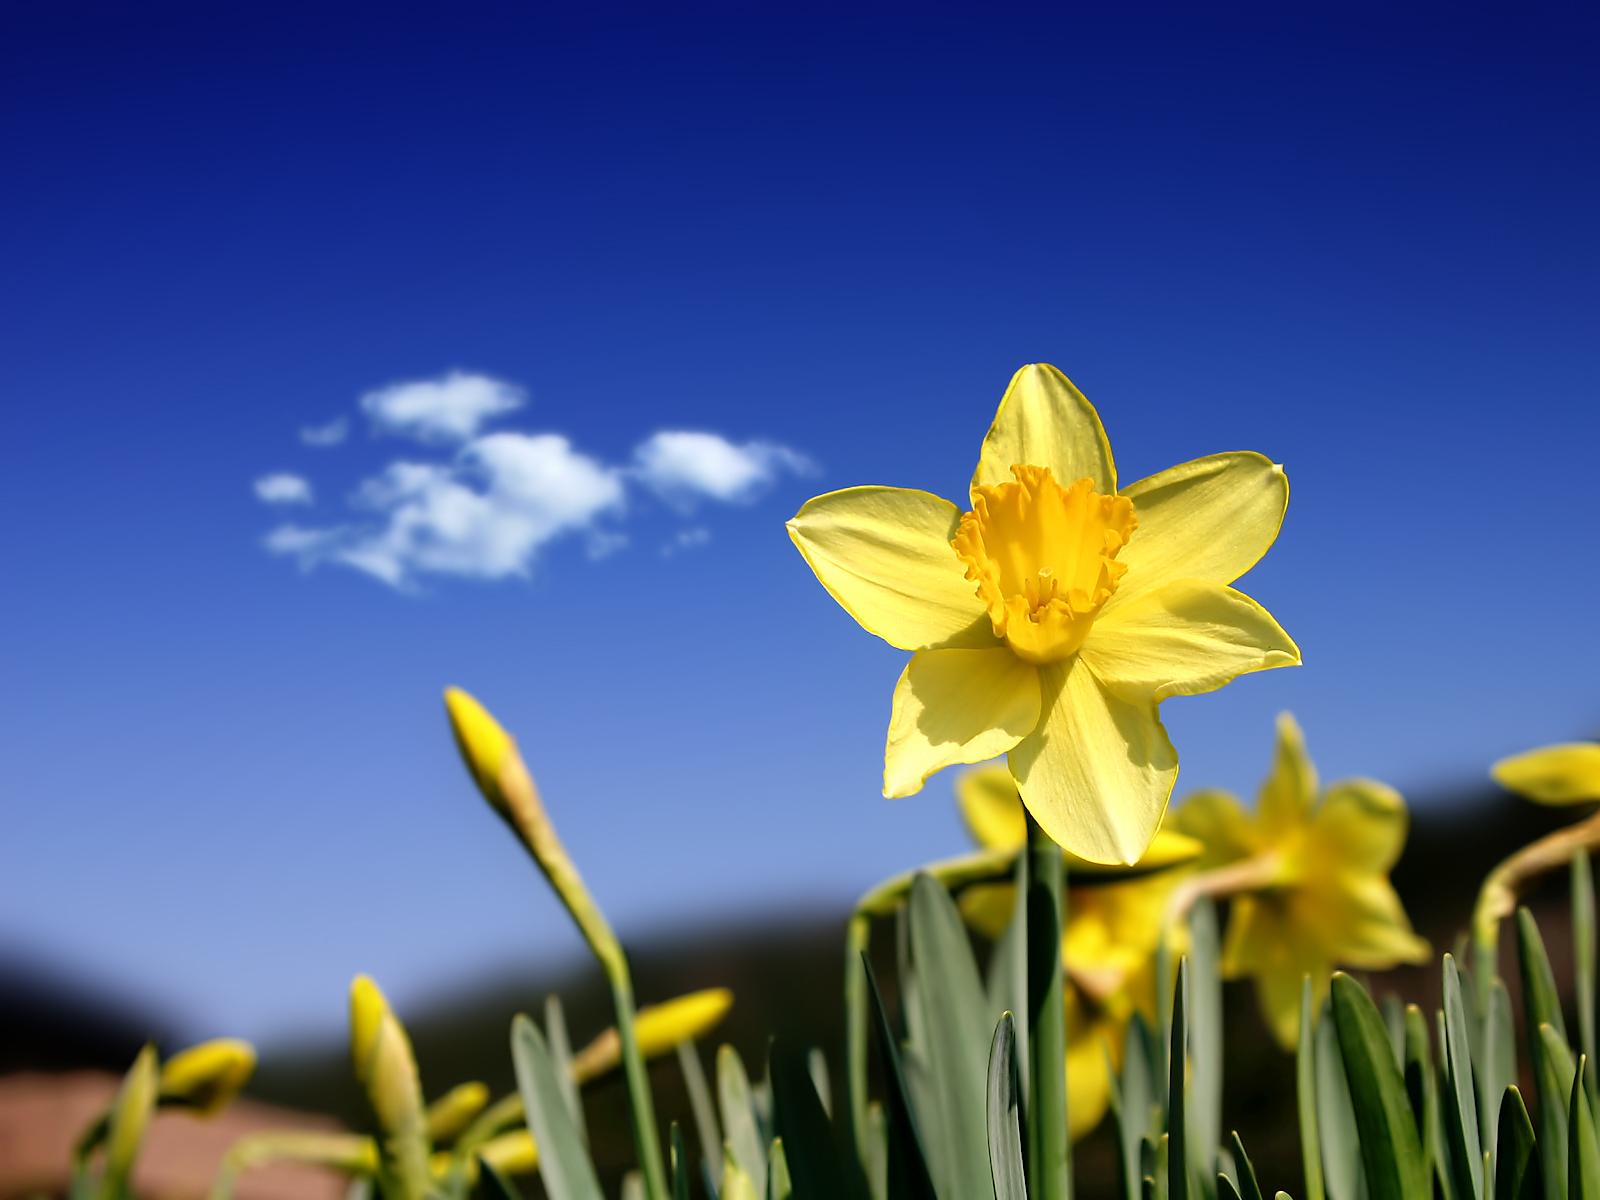 http://haltonhelps.org/Egardening/daffodil.htm